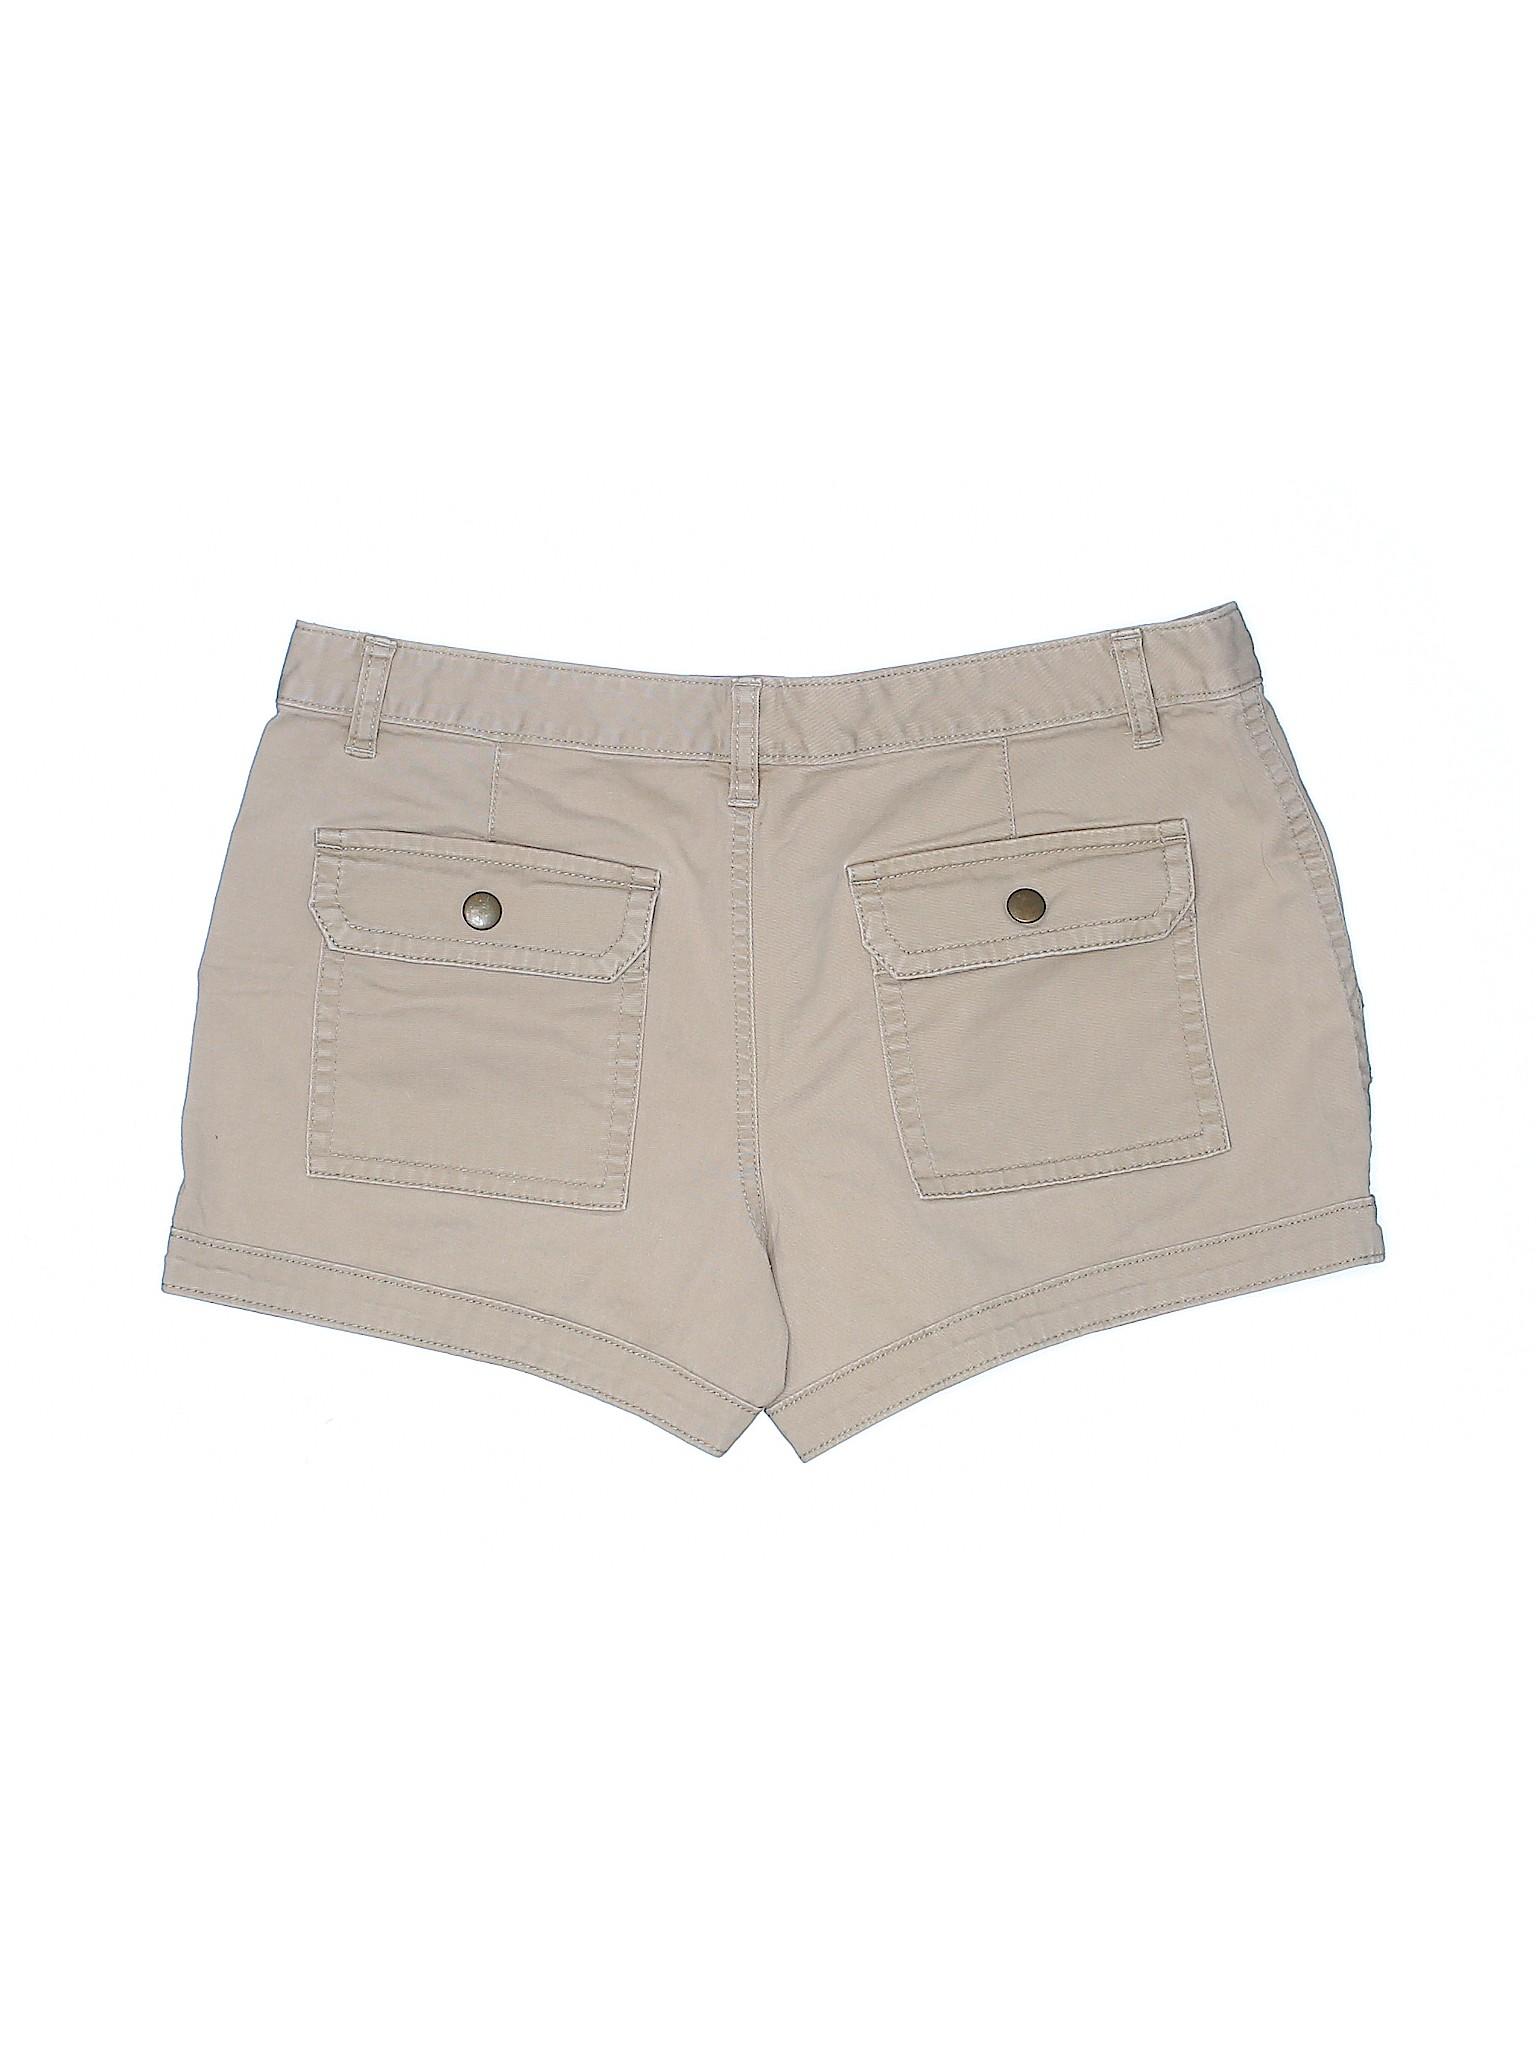 London Khaki Jean Boutique Boutique Shorts London Khaki Jean BHz85Kqw5